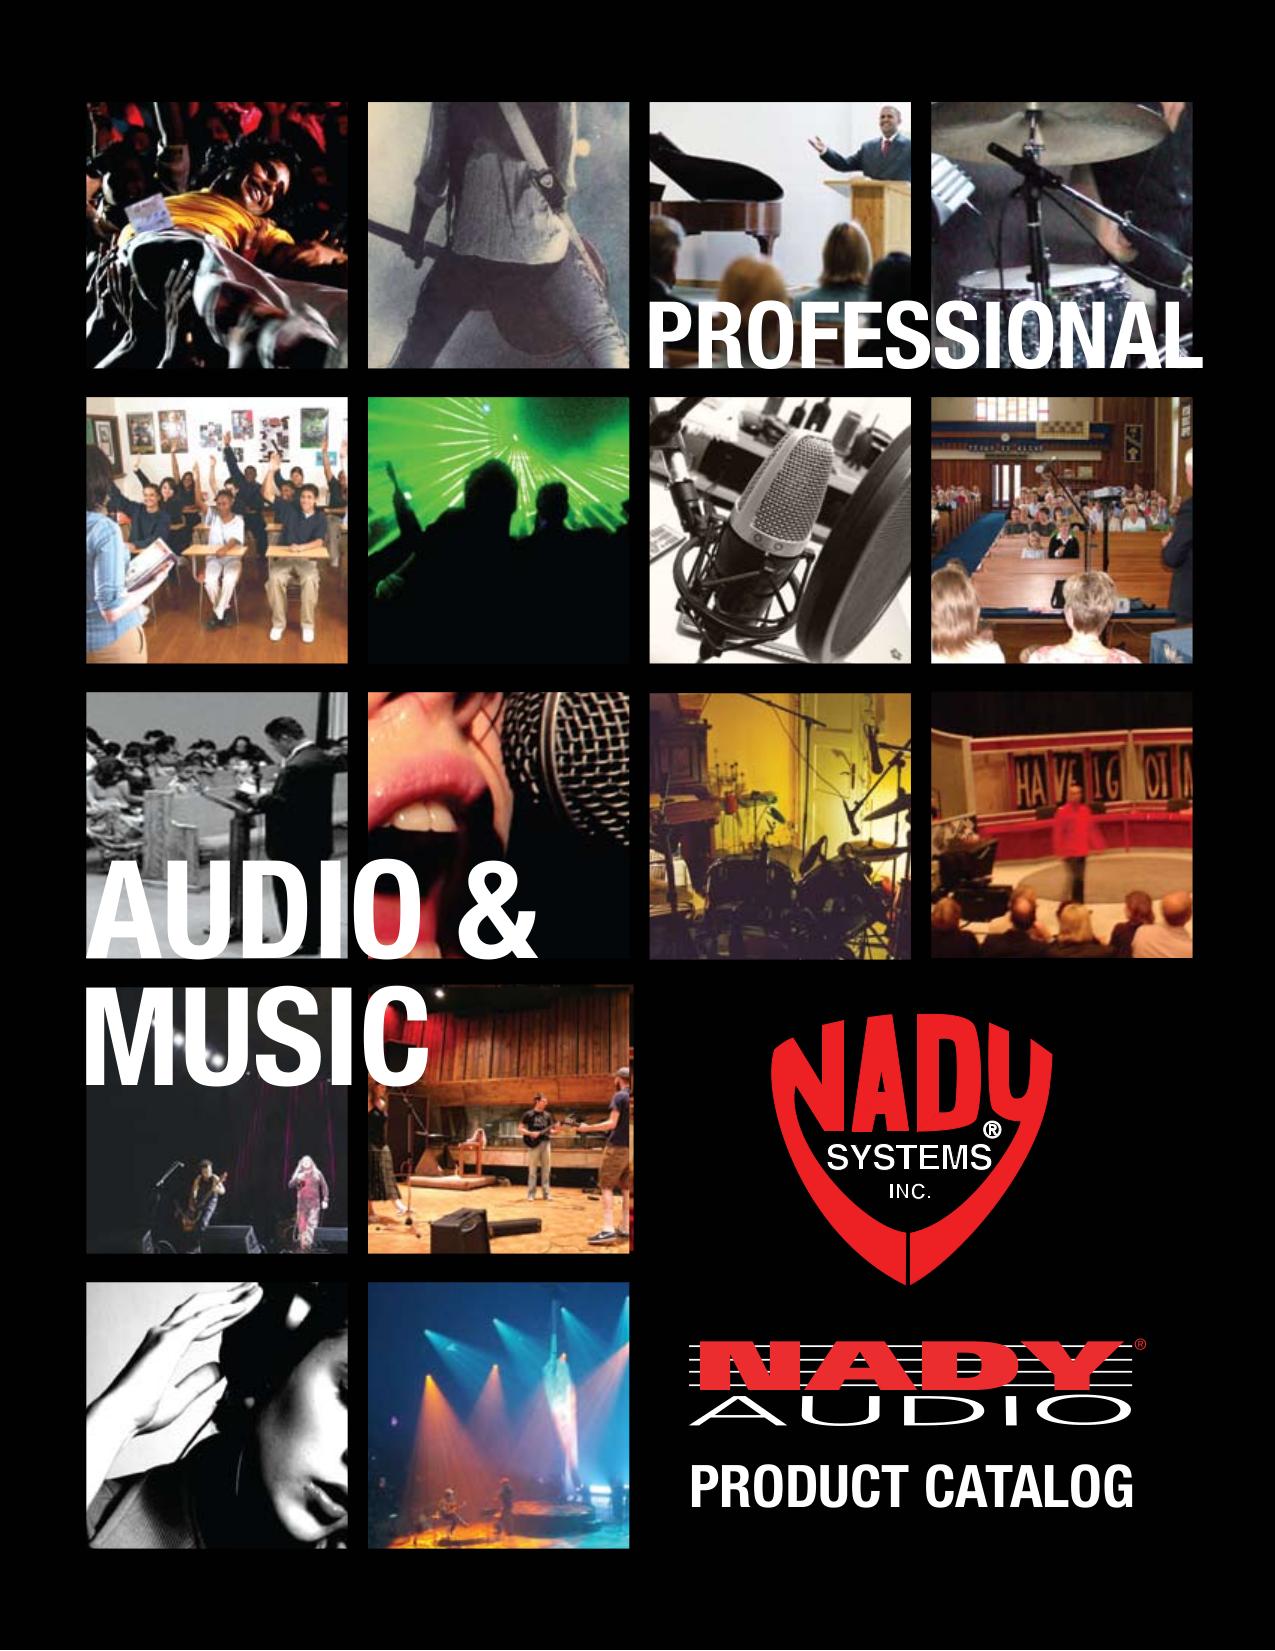 pdf for Nady Amp XA-1600 manual